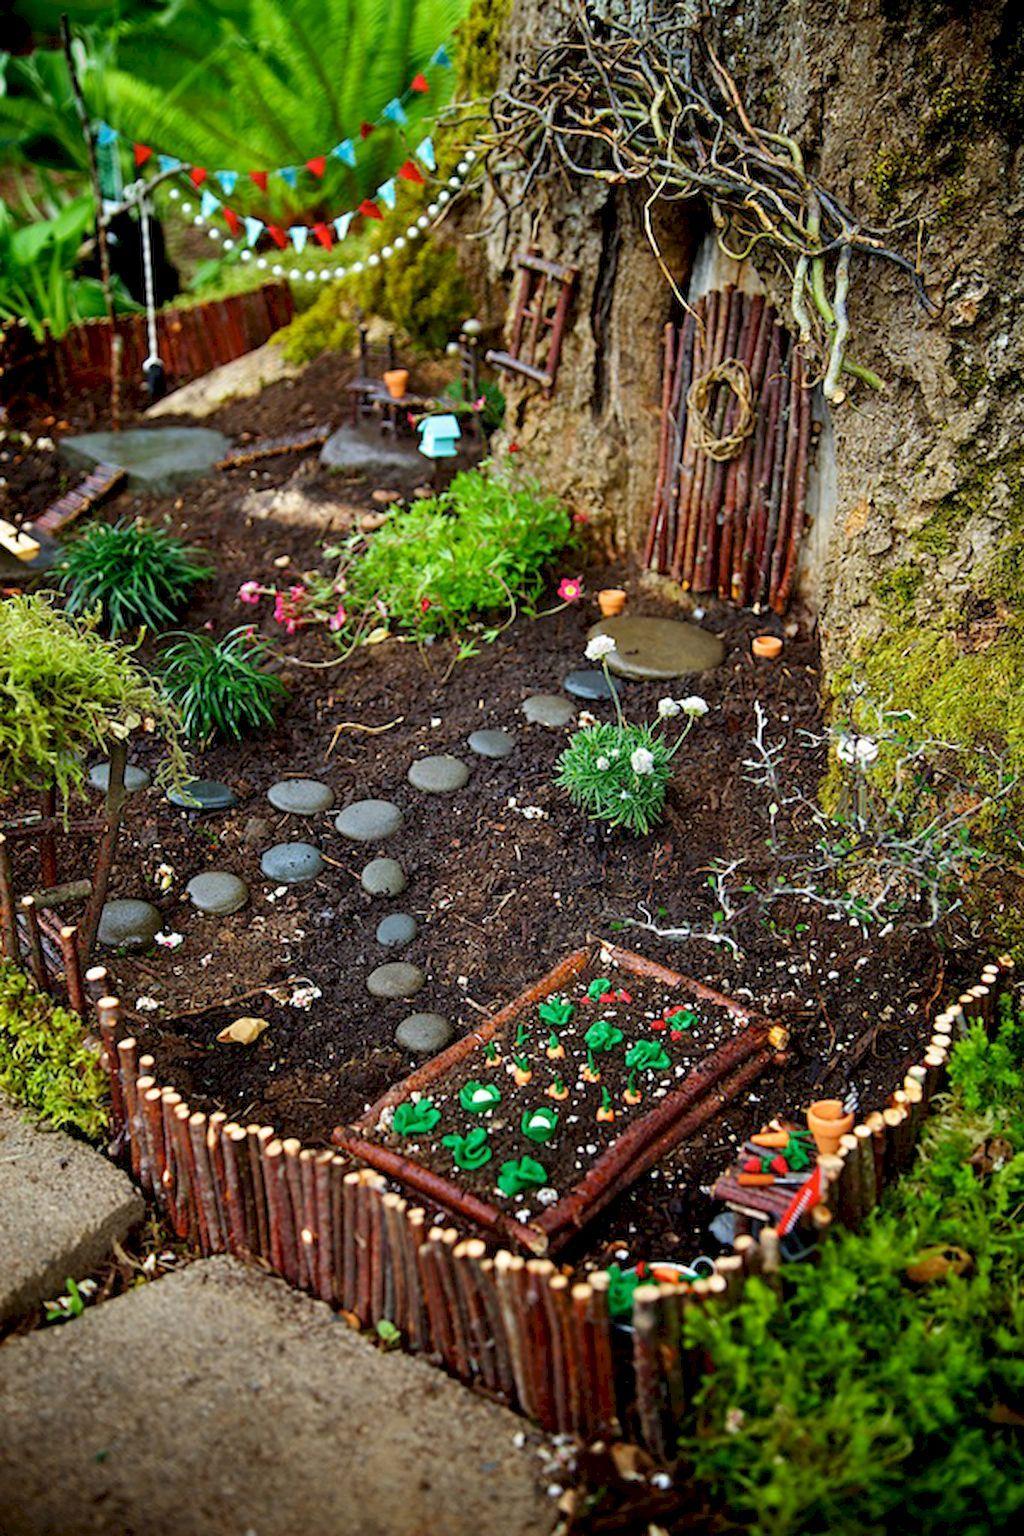 120 Amazing Backyard Fairy Garden Ideas on A Budget | Pinterest ...